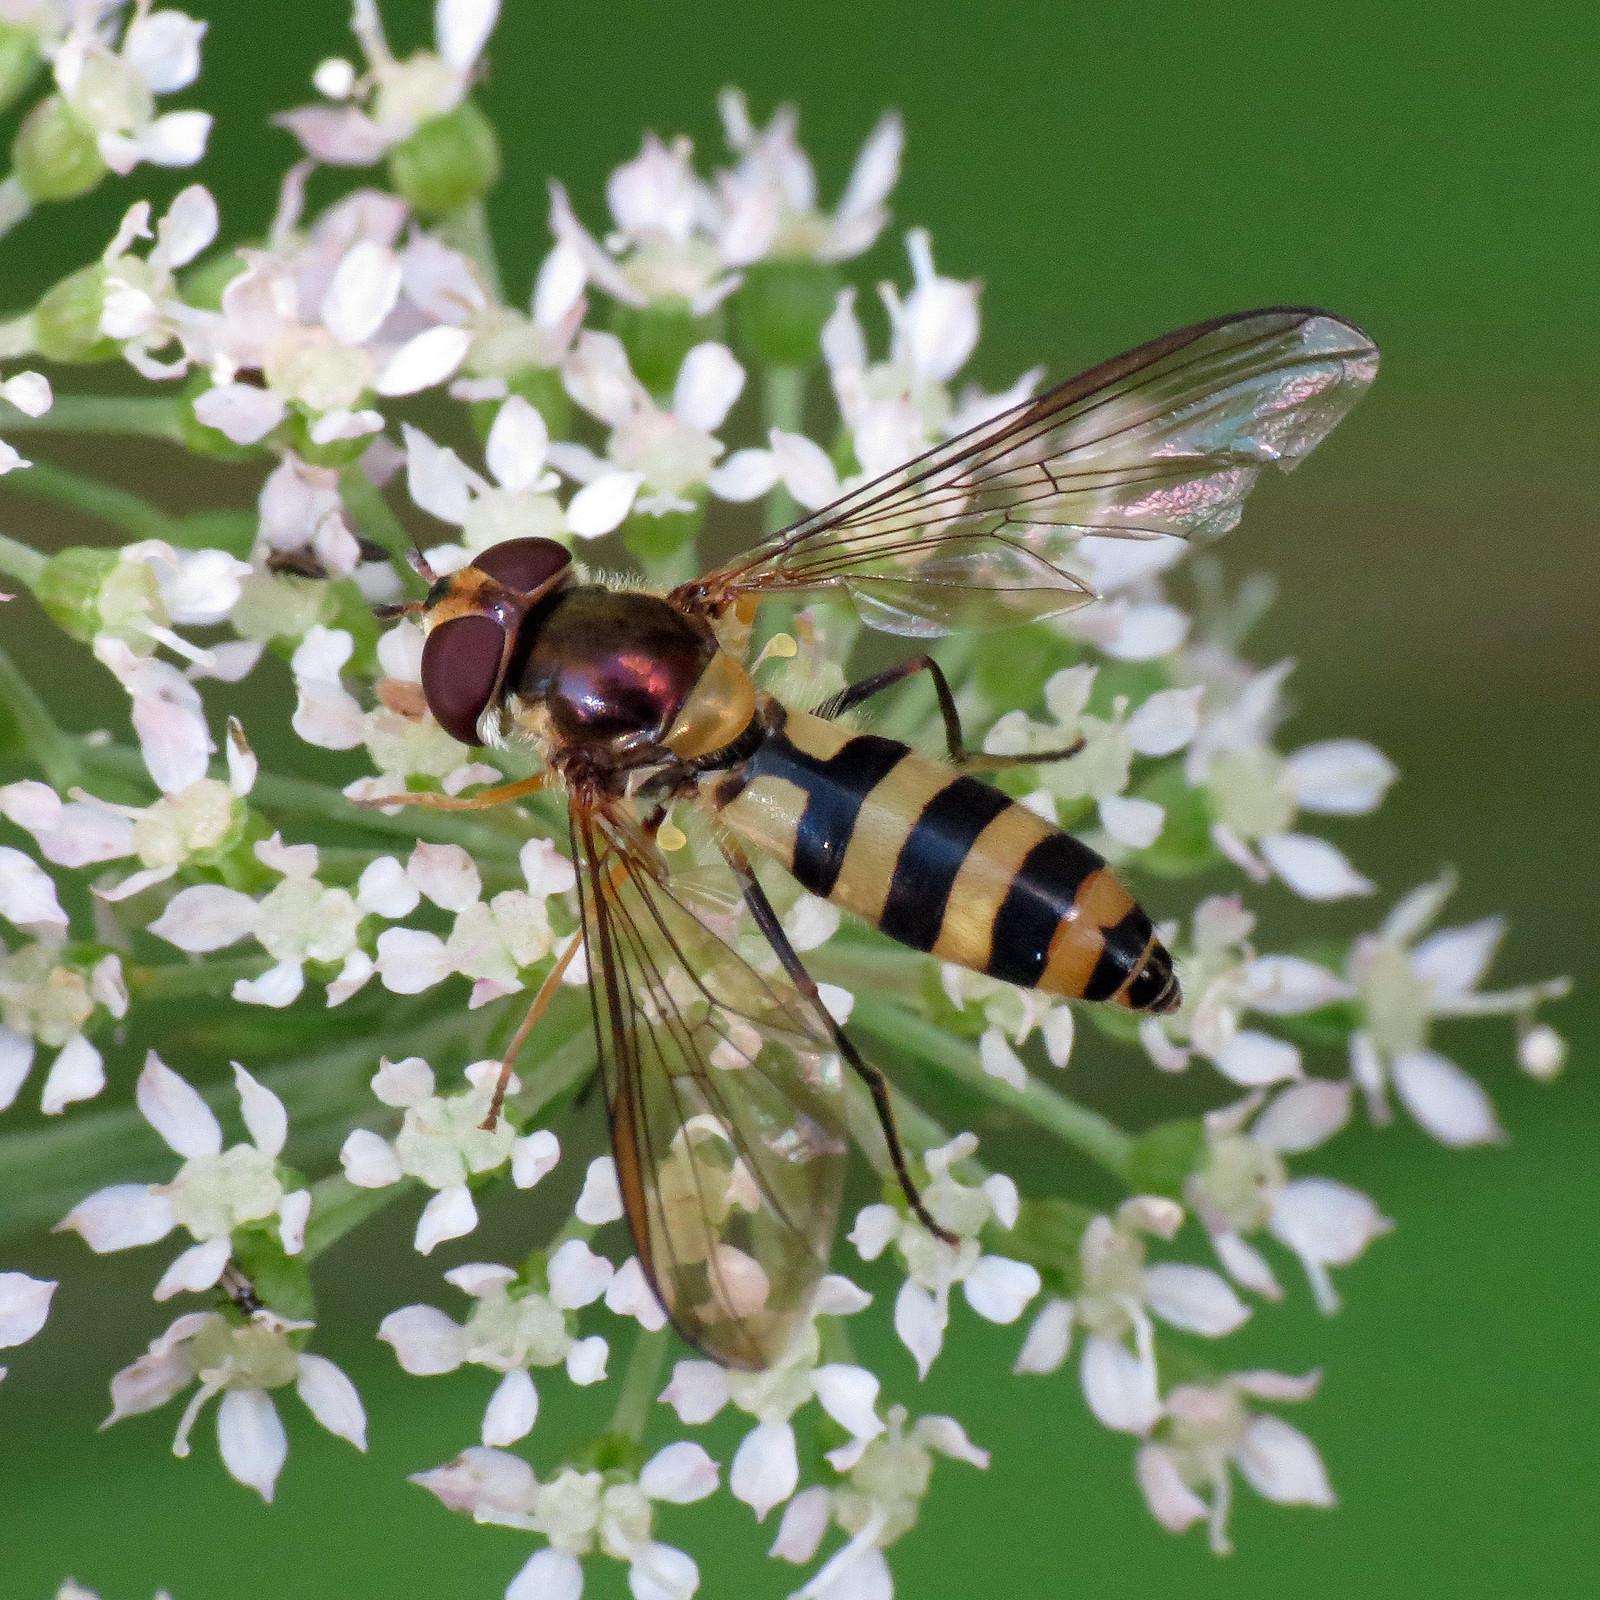 Hoverfly - Meliscaeva cinctella